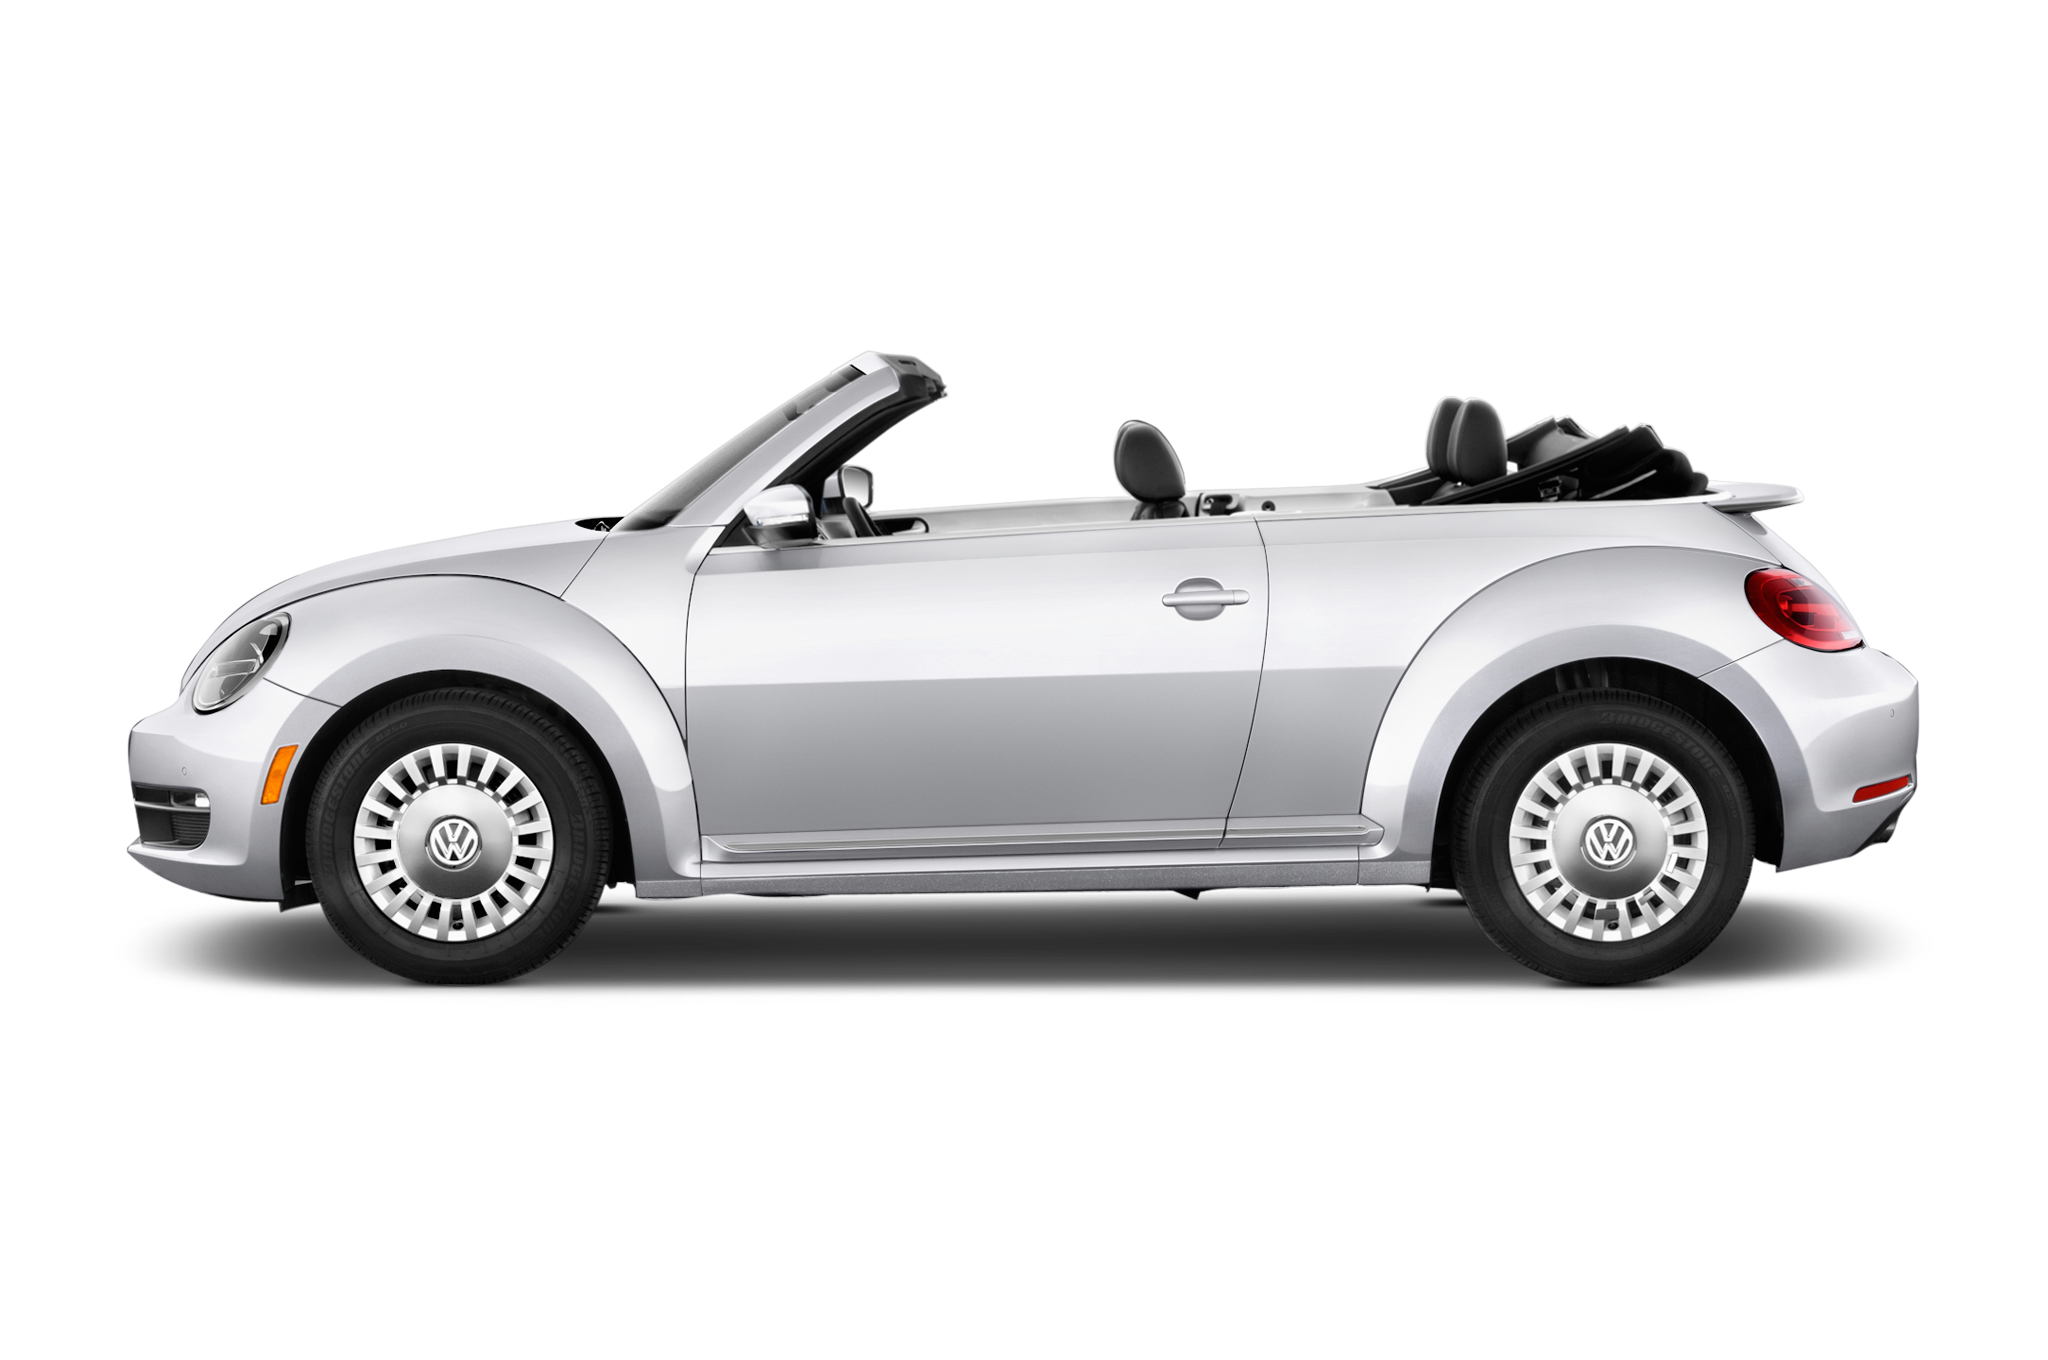 2015 volkswagen beetle adds classic model. Black Bedroom Furniture Sets. Home Design Ideas